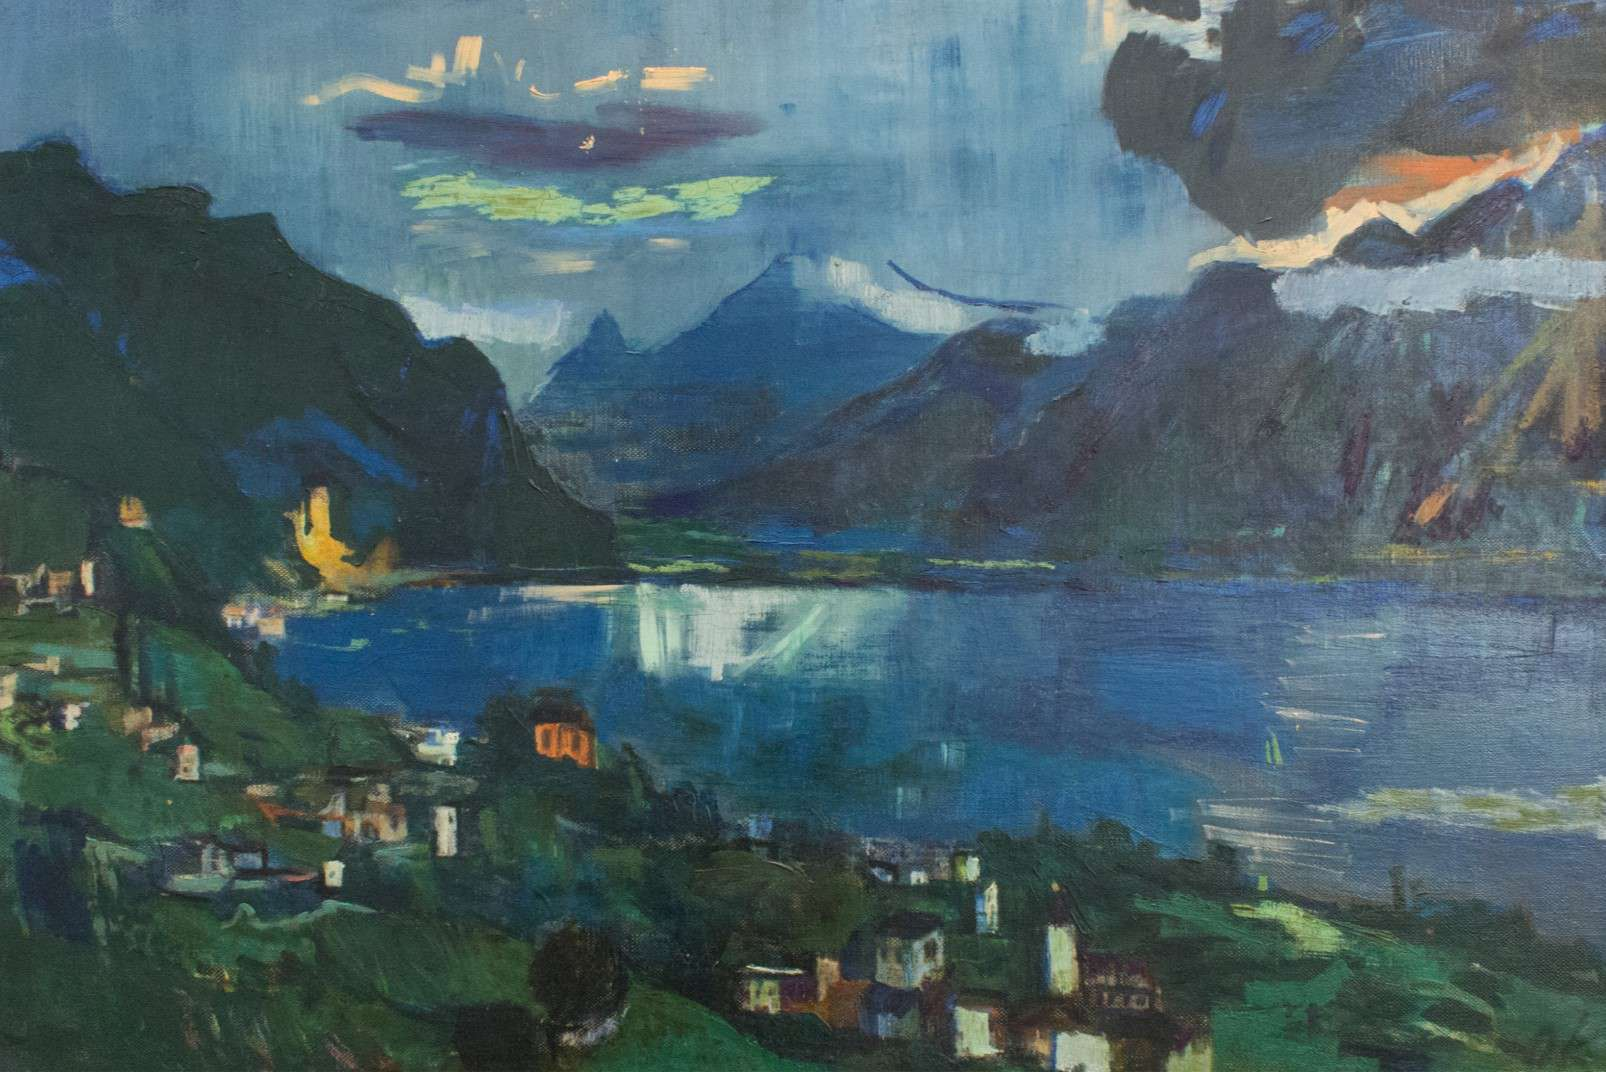 Oskar Kokoschka, -1924, Genfer-See II - Ulm